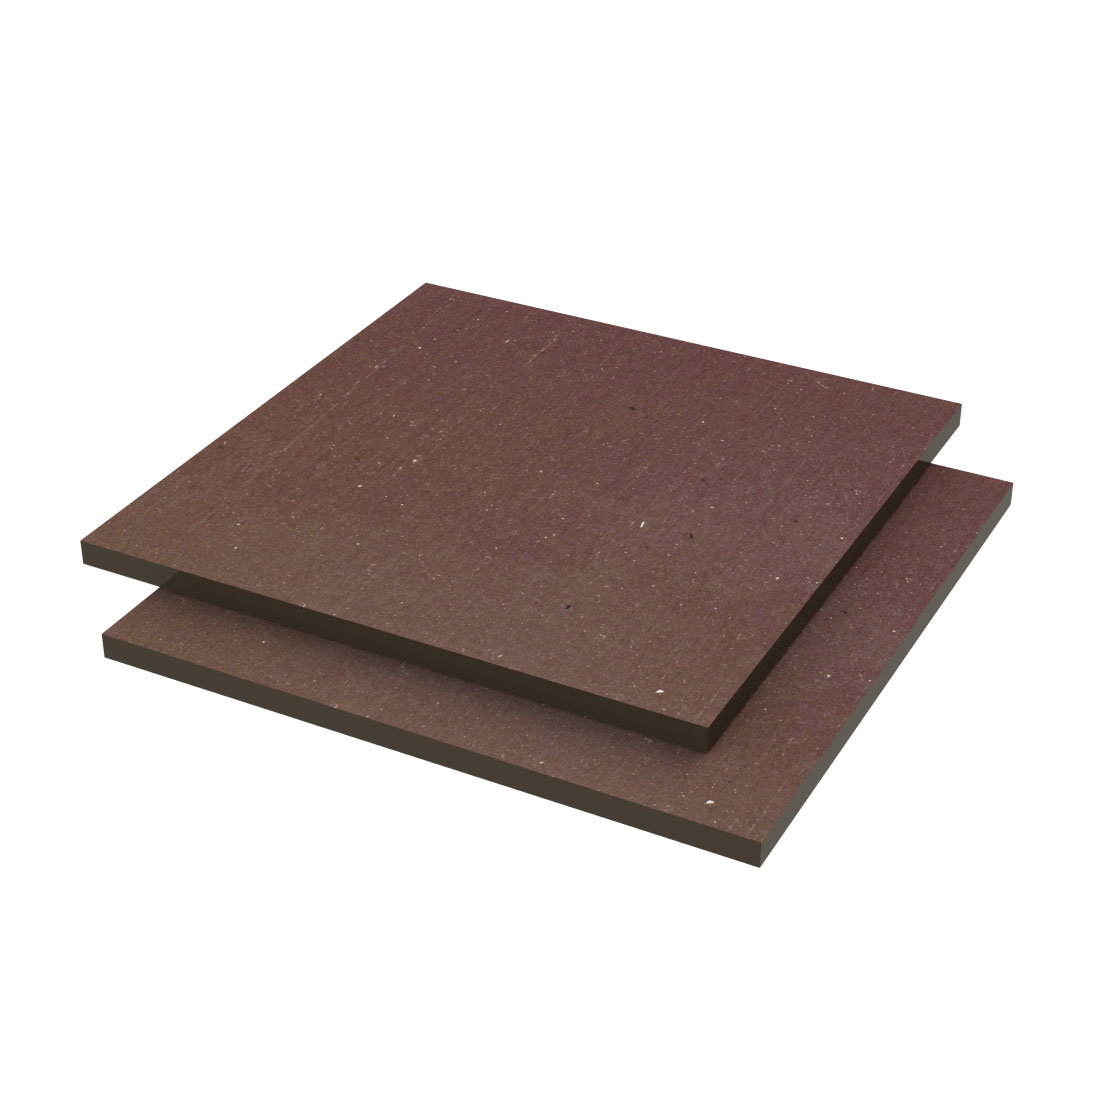 Vinplast Hardpapier Plaat PFCP201 Bruin 2050x1050x0,5mm